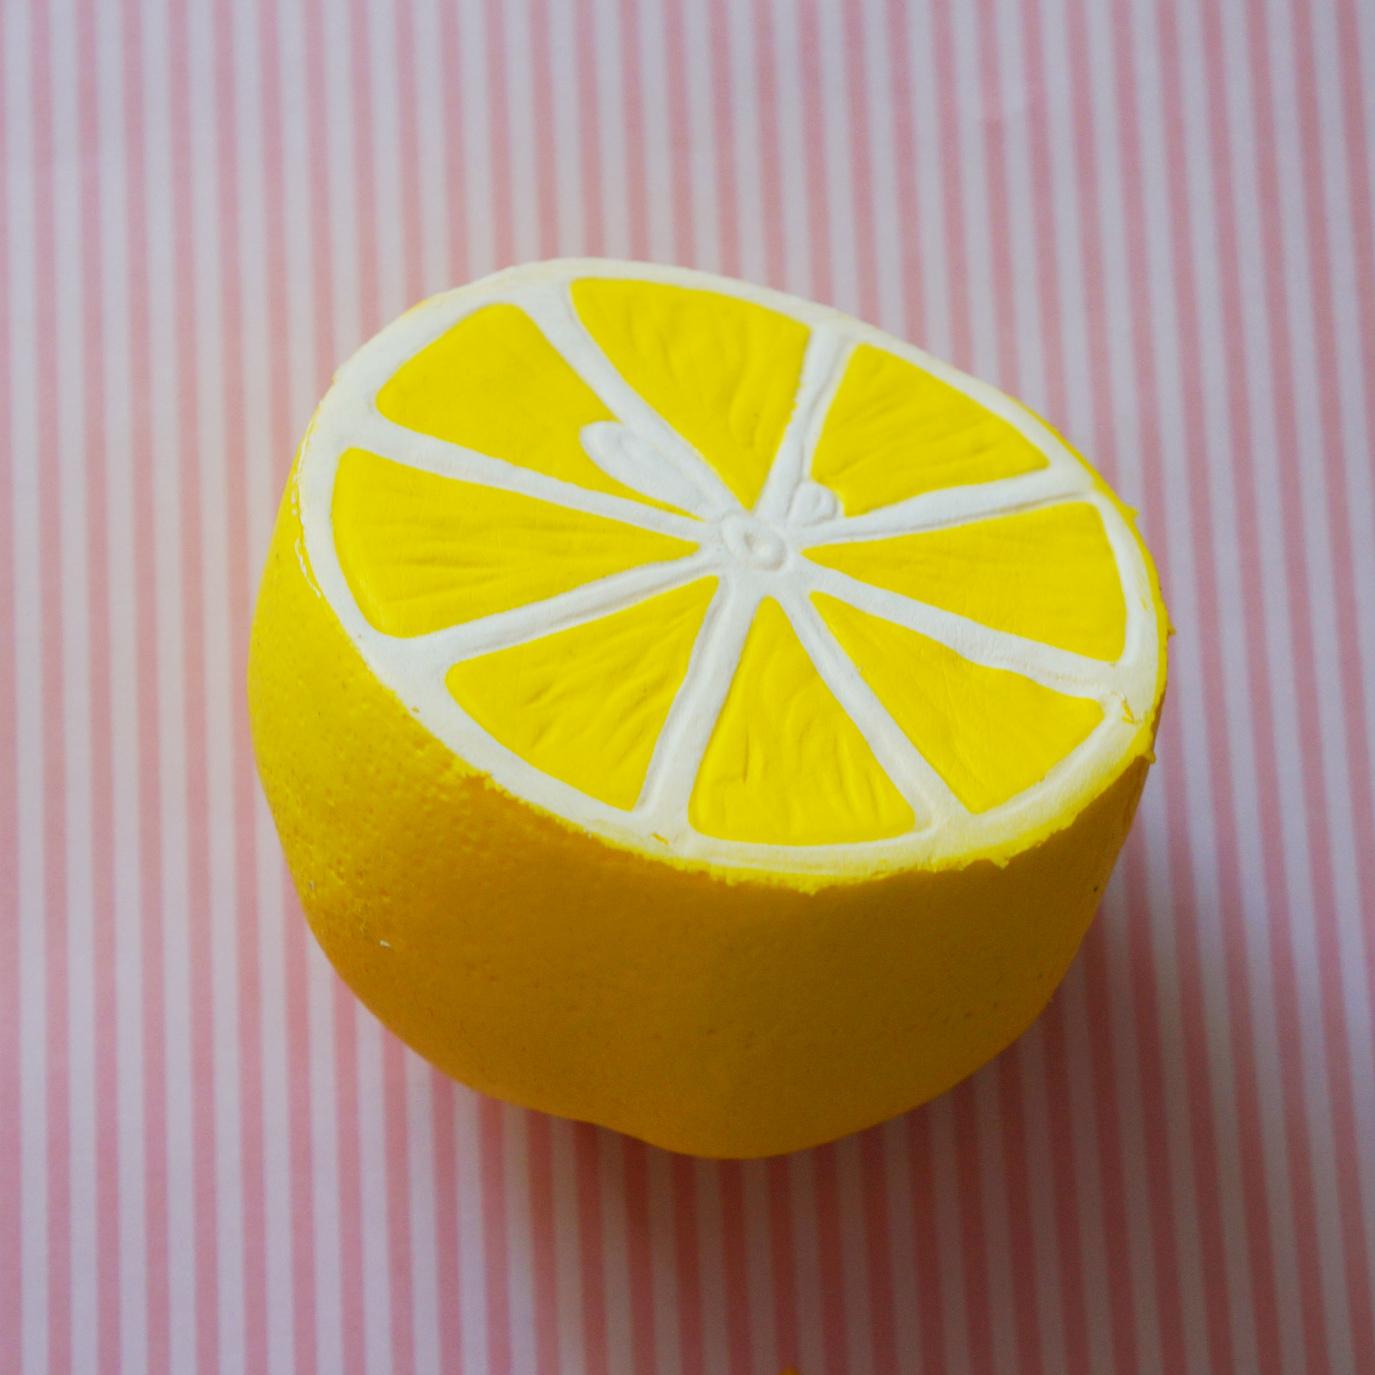 сквиши антистресс лимон купить недорого